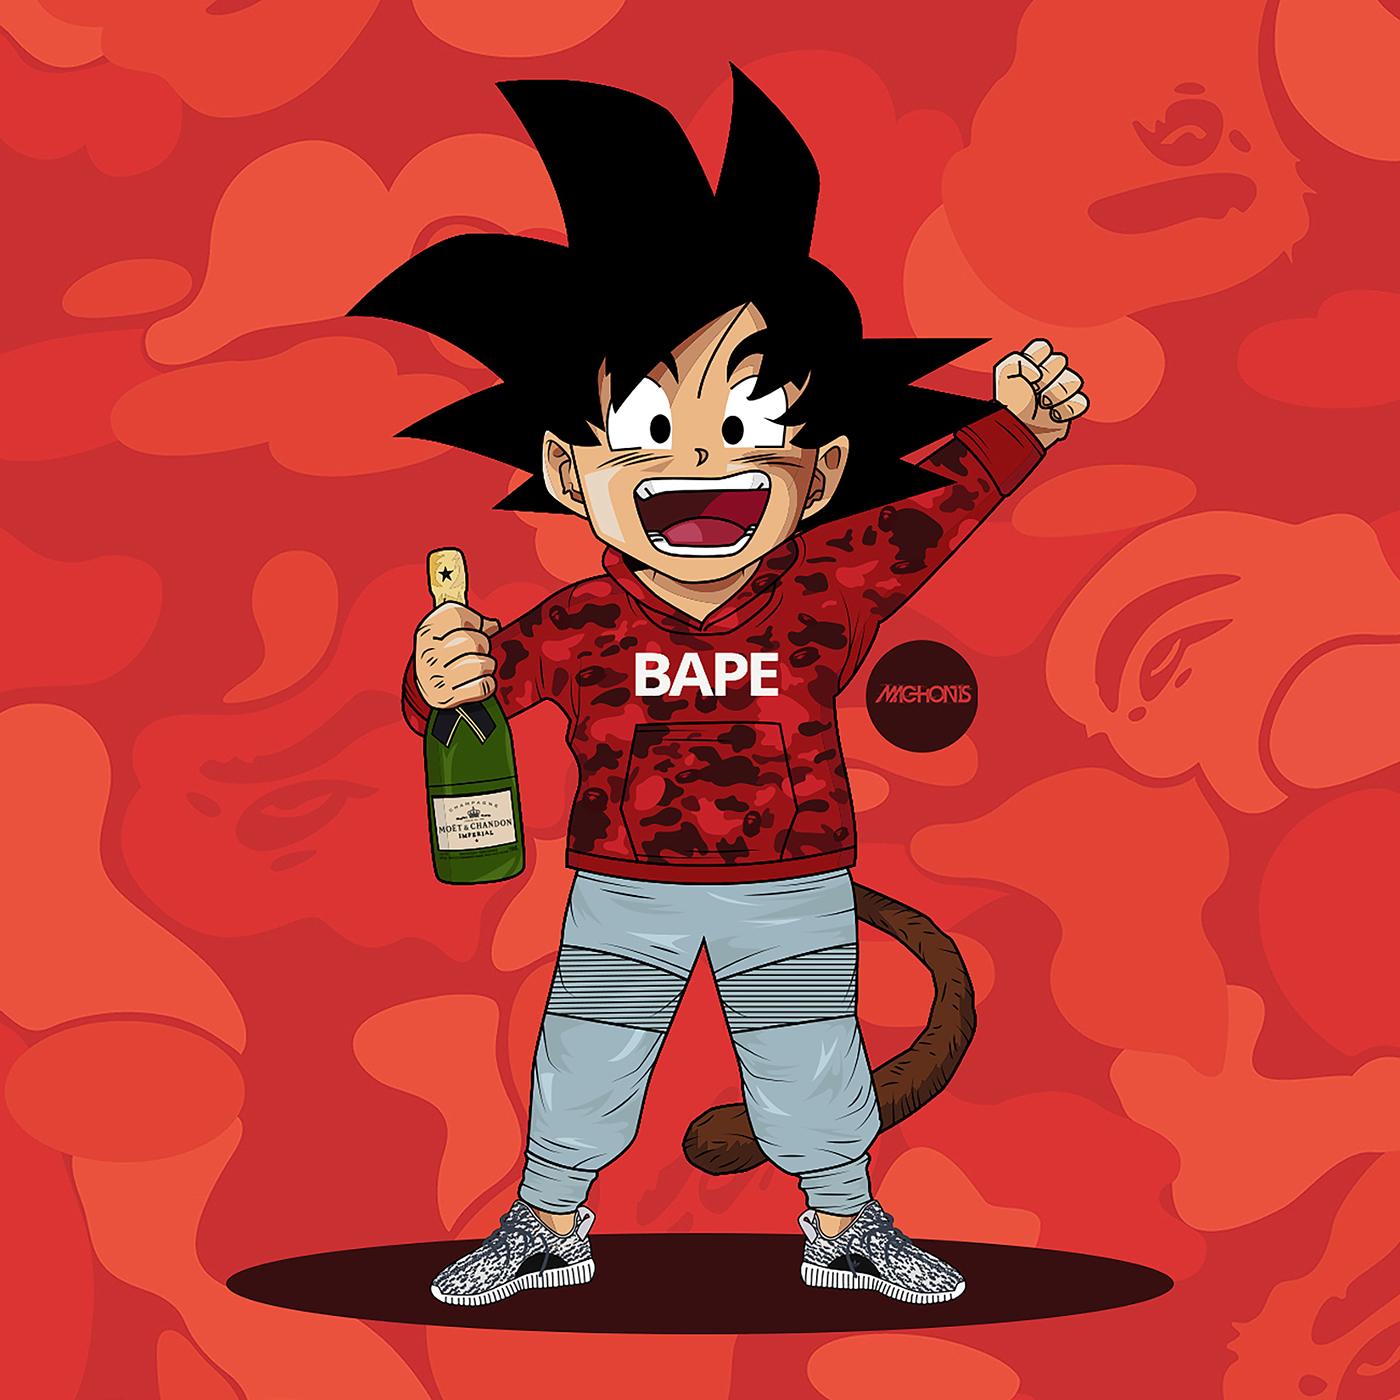 Dragon Ball Z x BAPE x Yeezy Boost 350 Turtle Dove on Behance 1400x1400